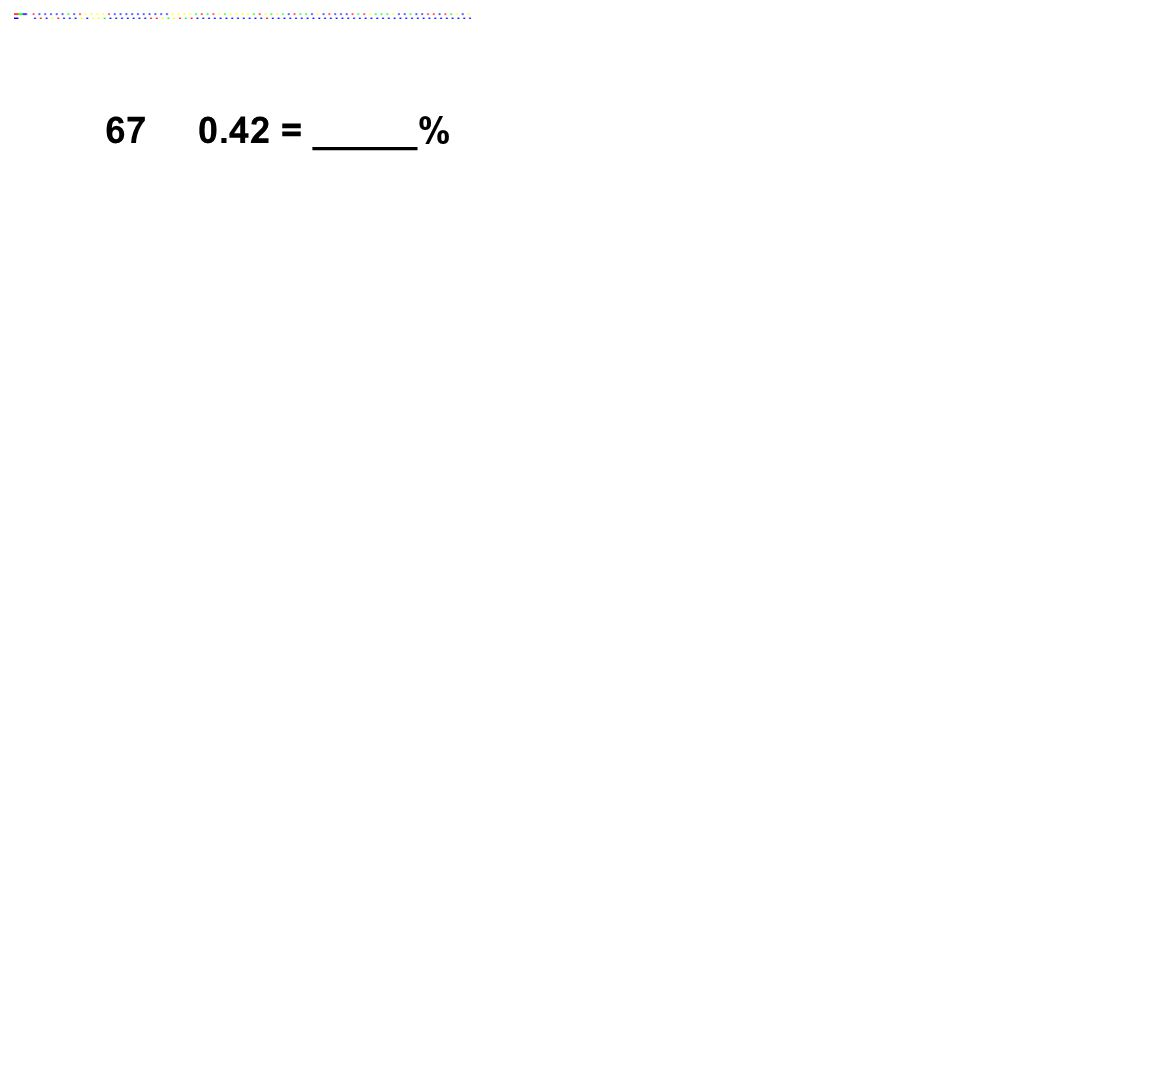 670.42 = _____%